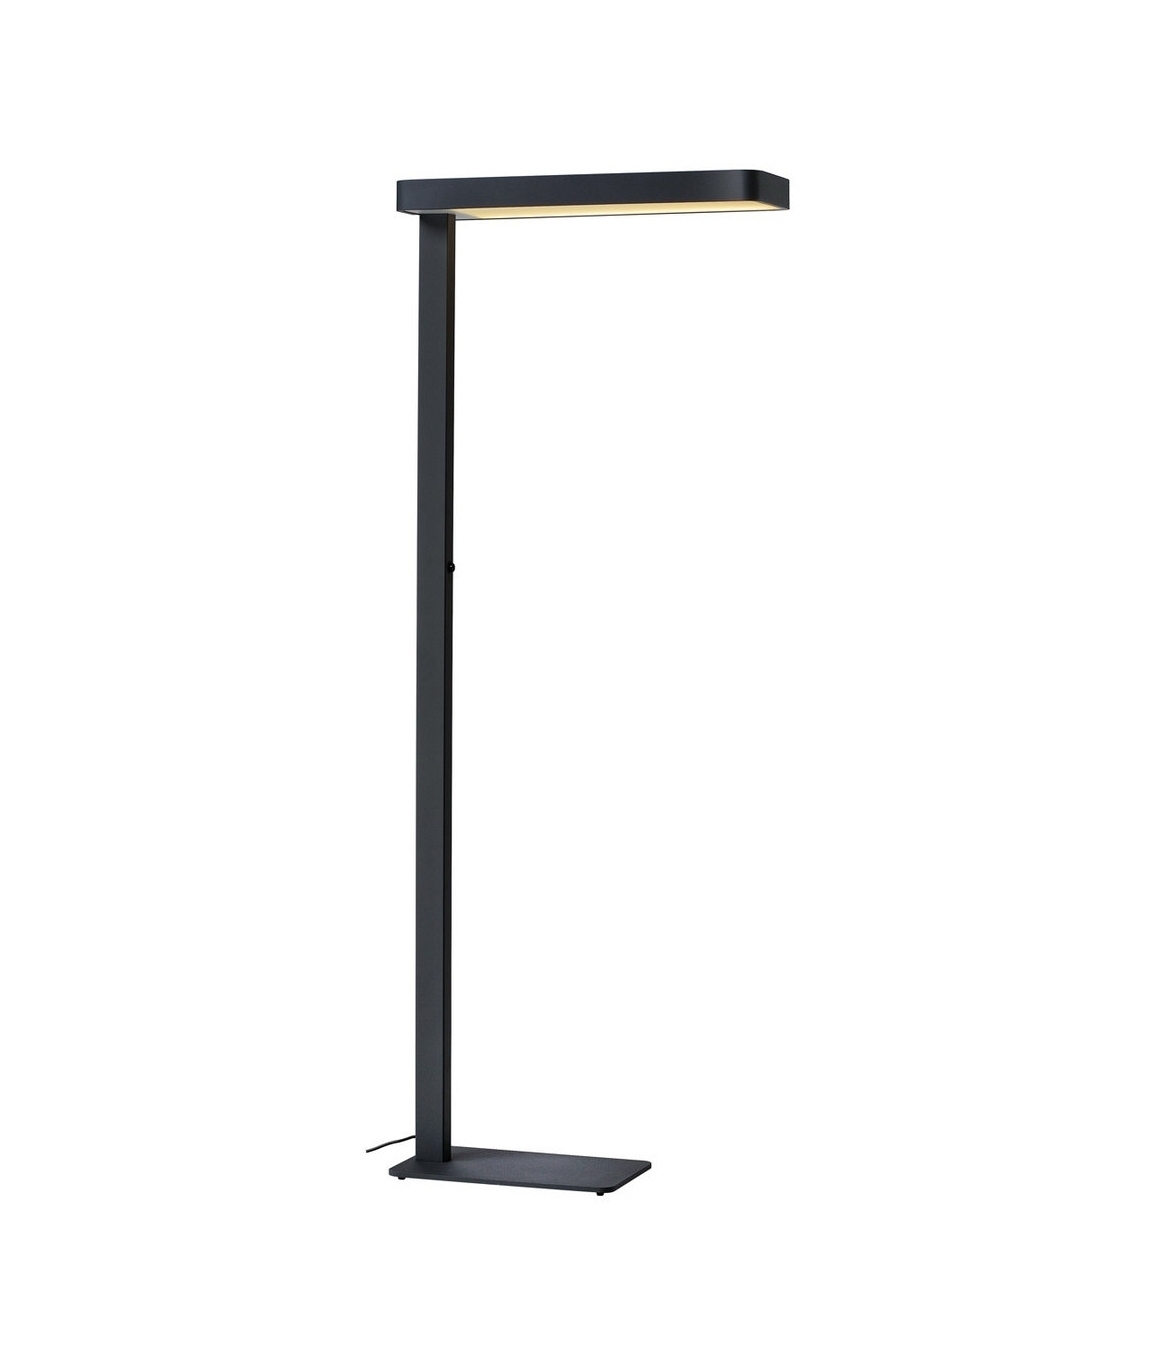 stylish free standing floor light for workstations. Black Bedroom Furniture Sets. Home Design Ideas